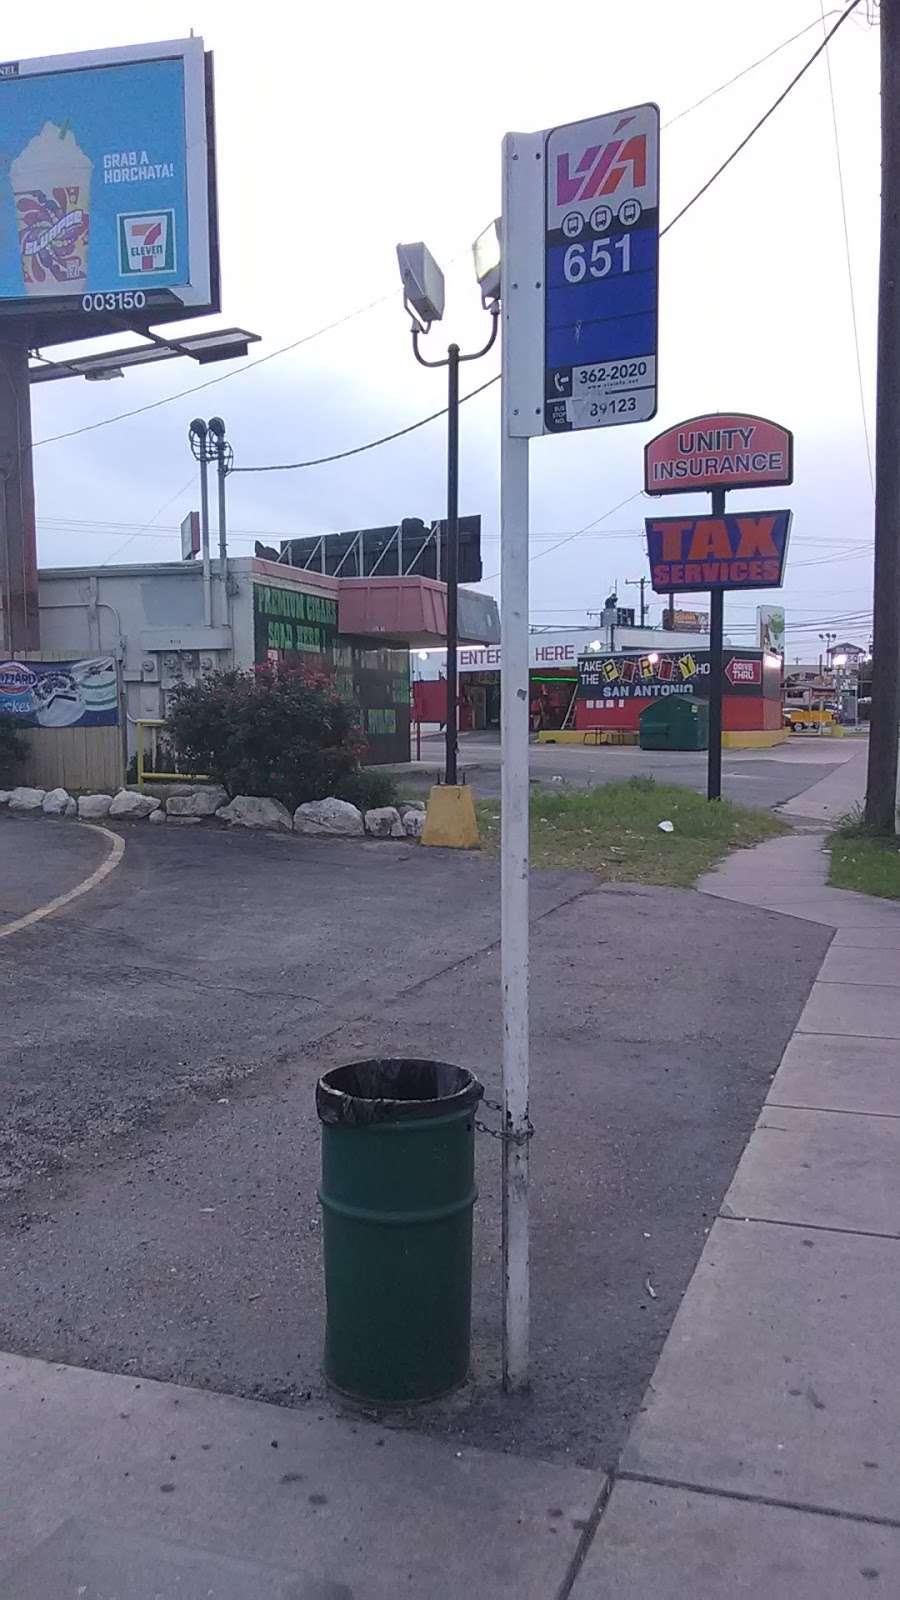 Jackson-Keller in Front of 1914 - bus station  | Photo 1 of 1 | Address: San Antonio, TX 78213, USA